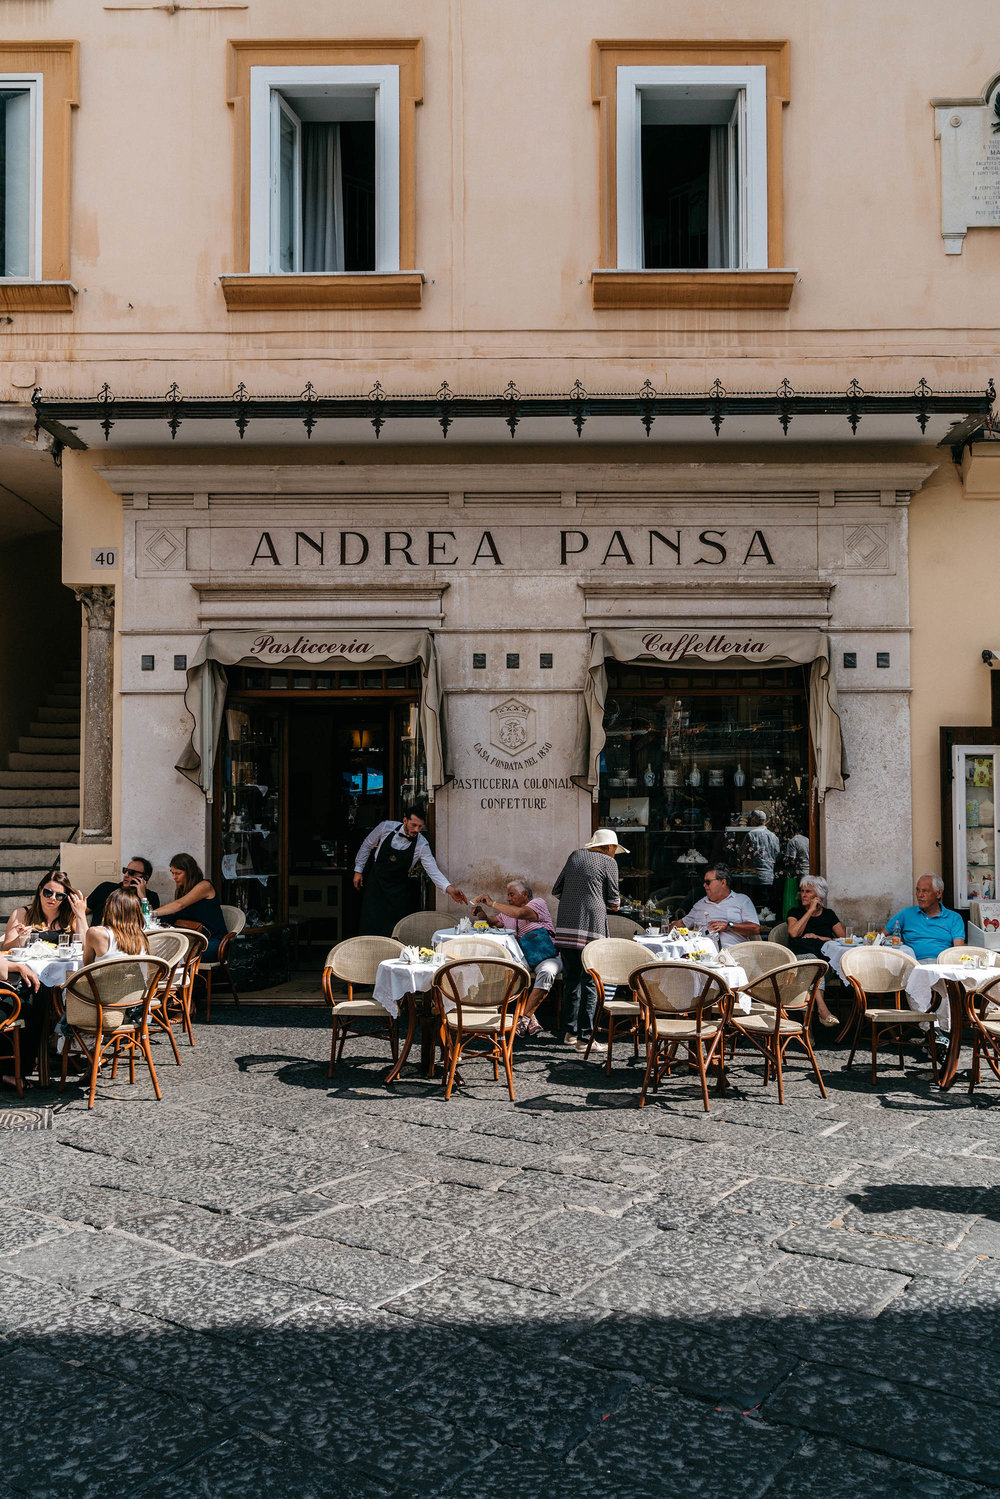 Pasticceria Andrea Pansa